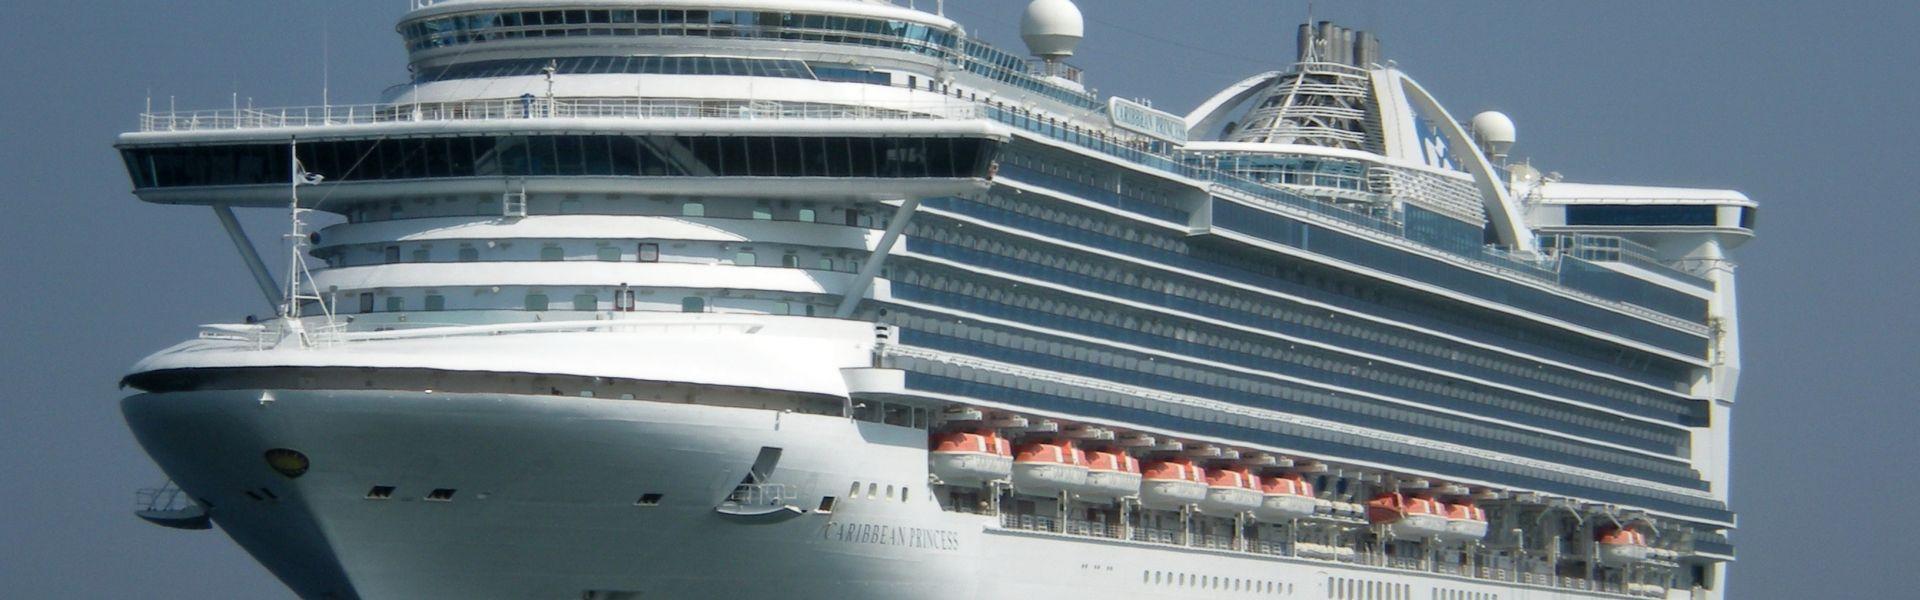 Croaziera 2017 - Caraibele de Vest (Fort Lauderdale) - Princess Cruises - Caribbean Princess - 6 nopti